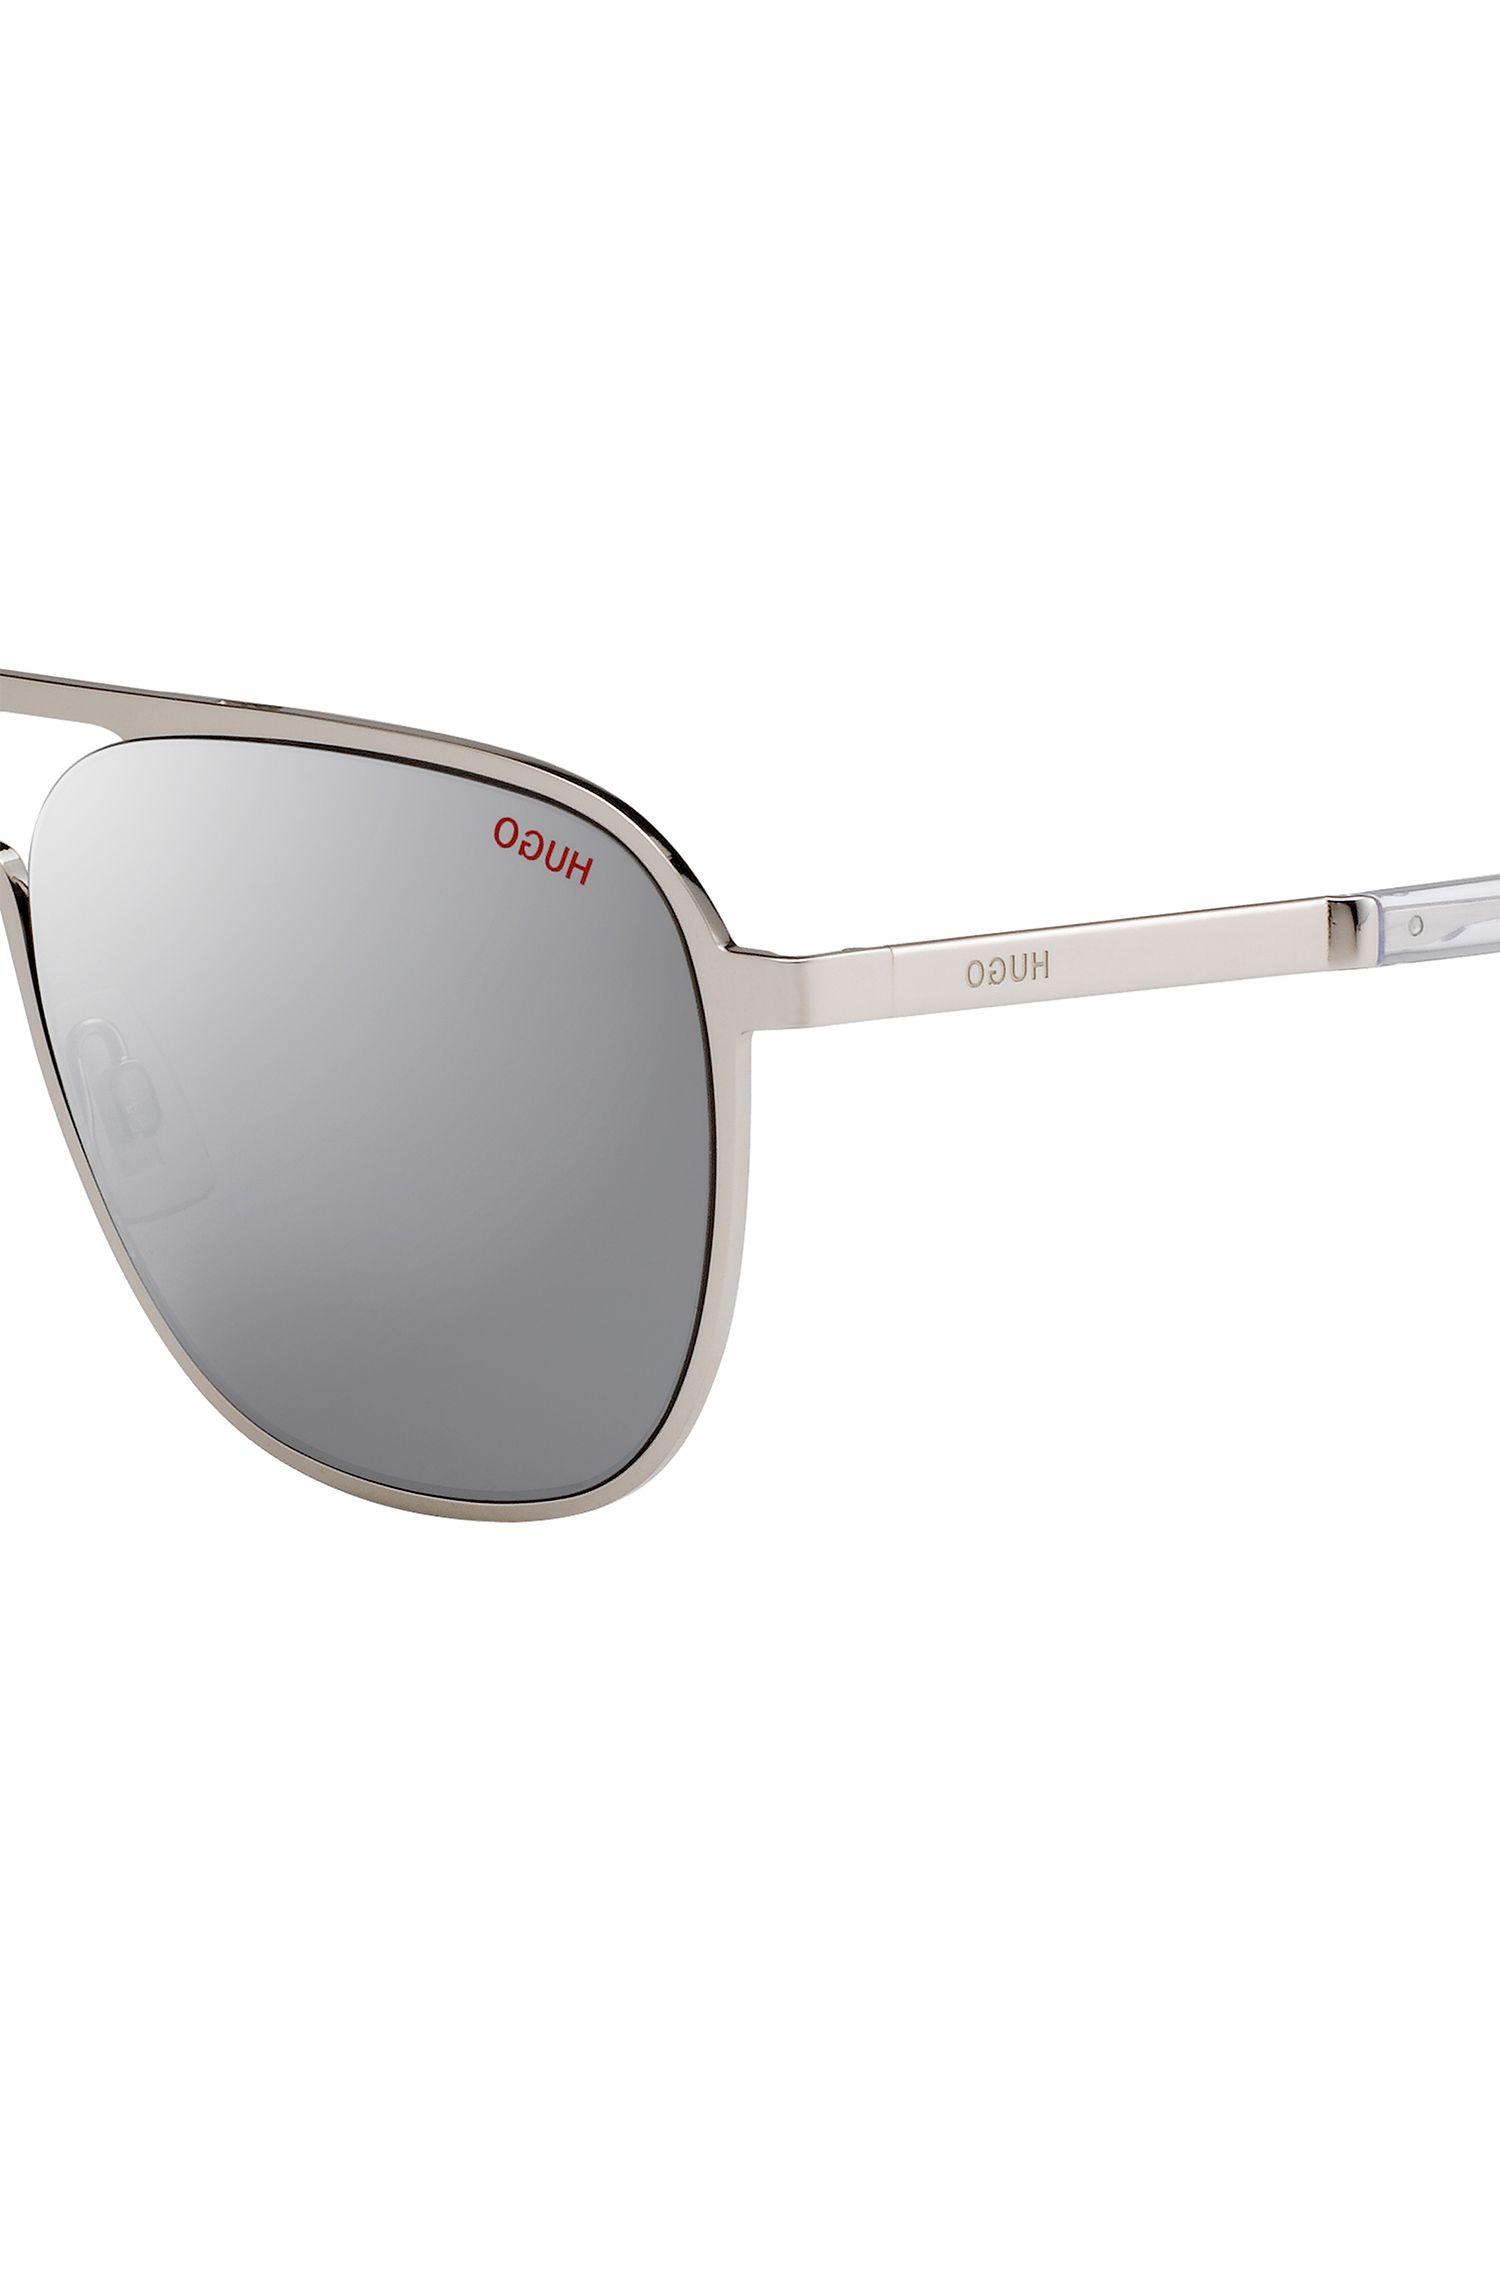 Silver-tone aviator sunglasses with mirrored lenses, Silver